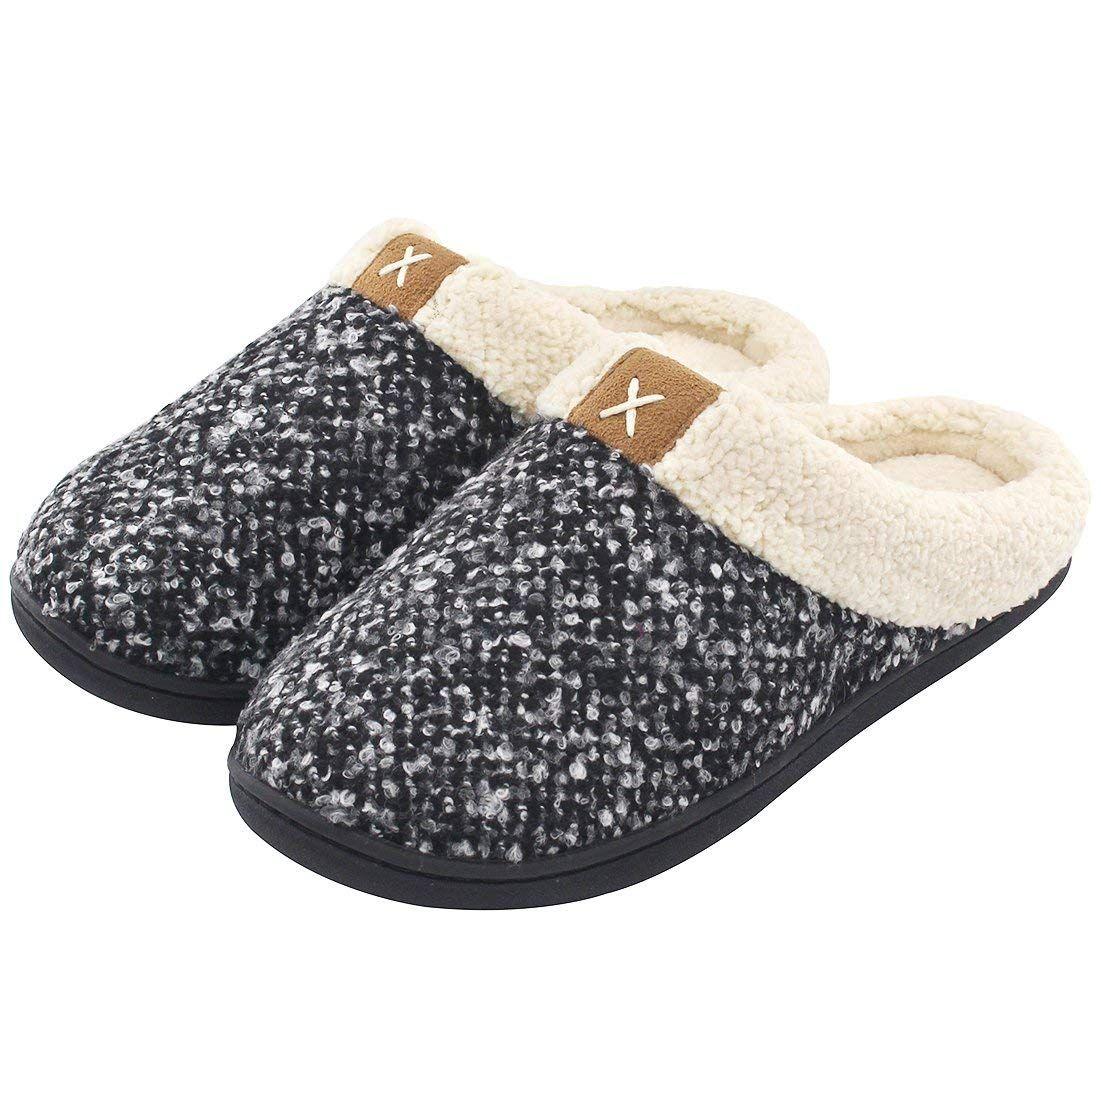 Lucky cat cotton slippers fashion non-slip soft home Idoor fleece